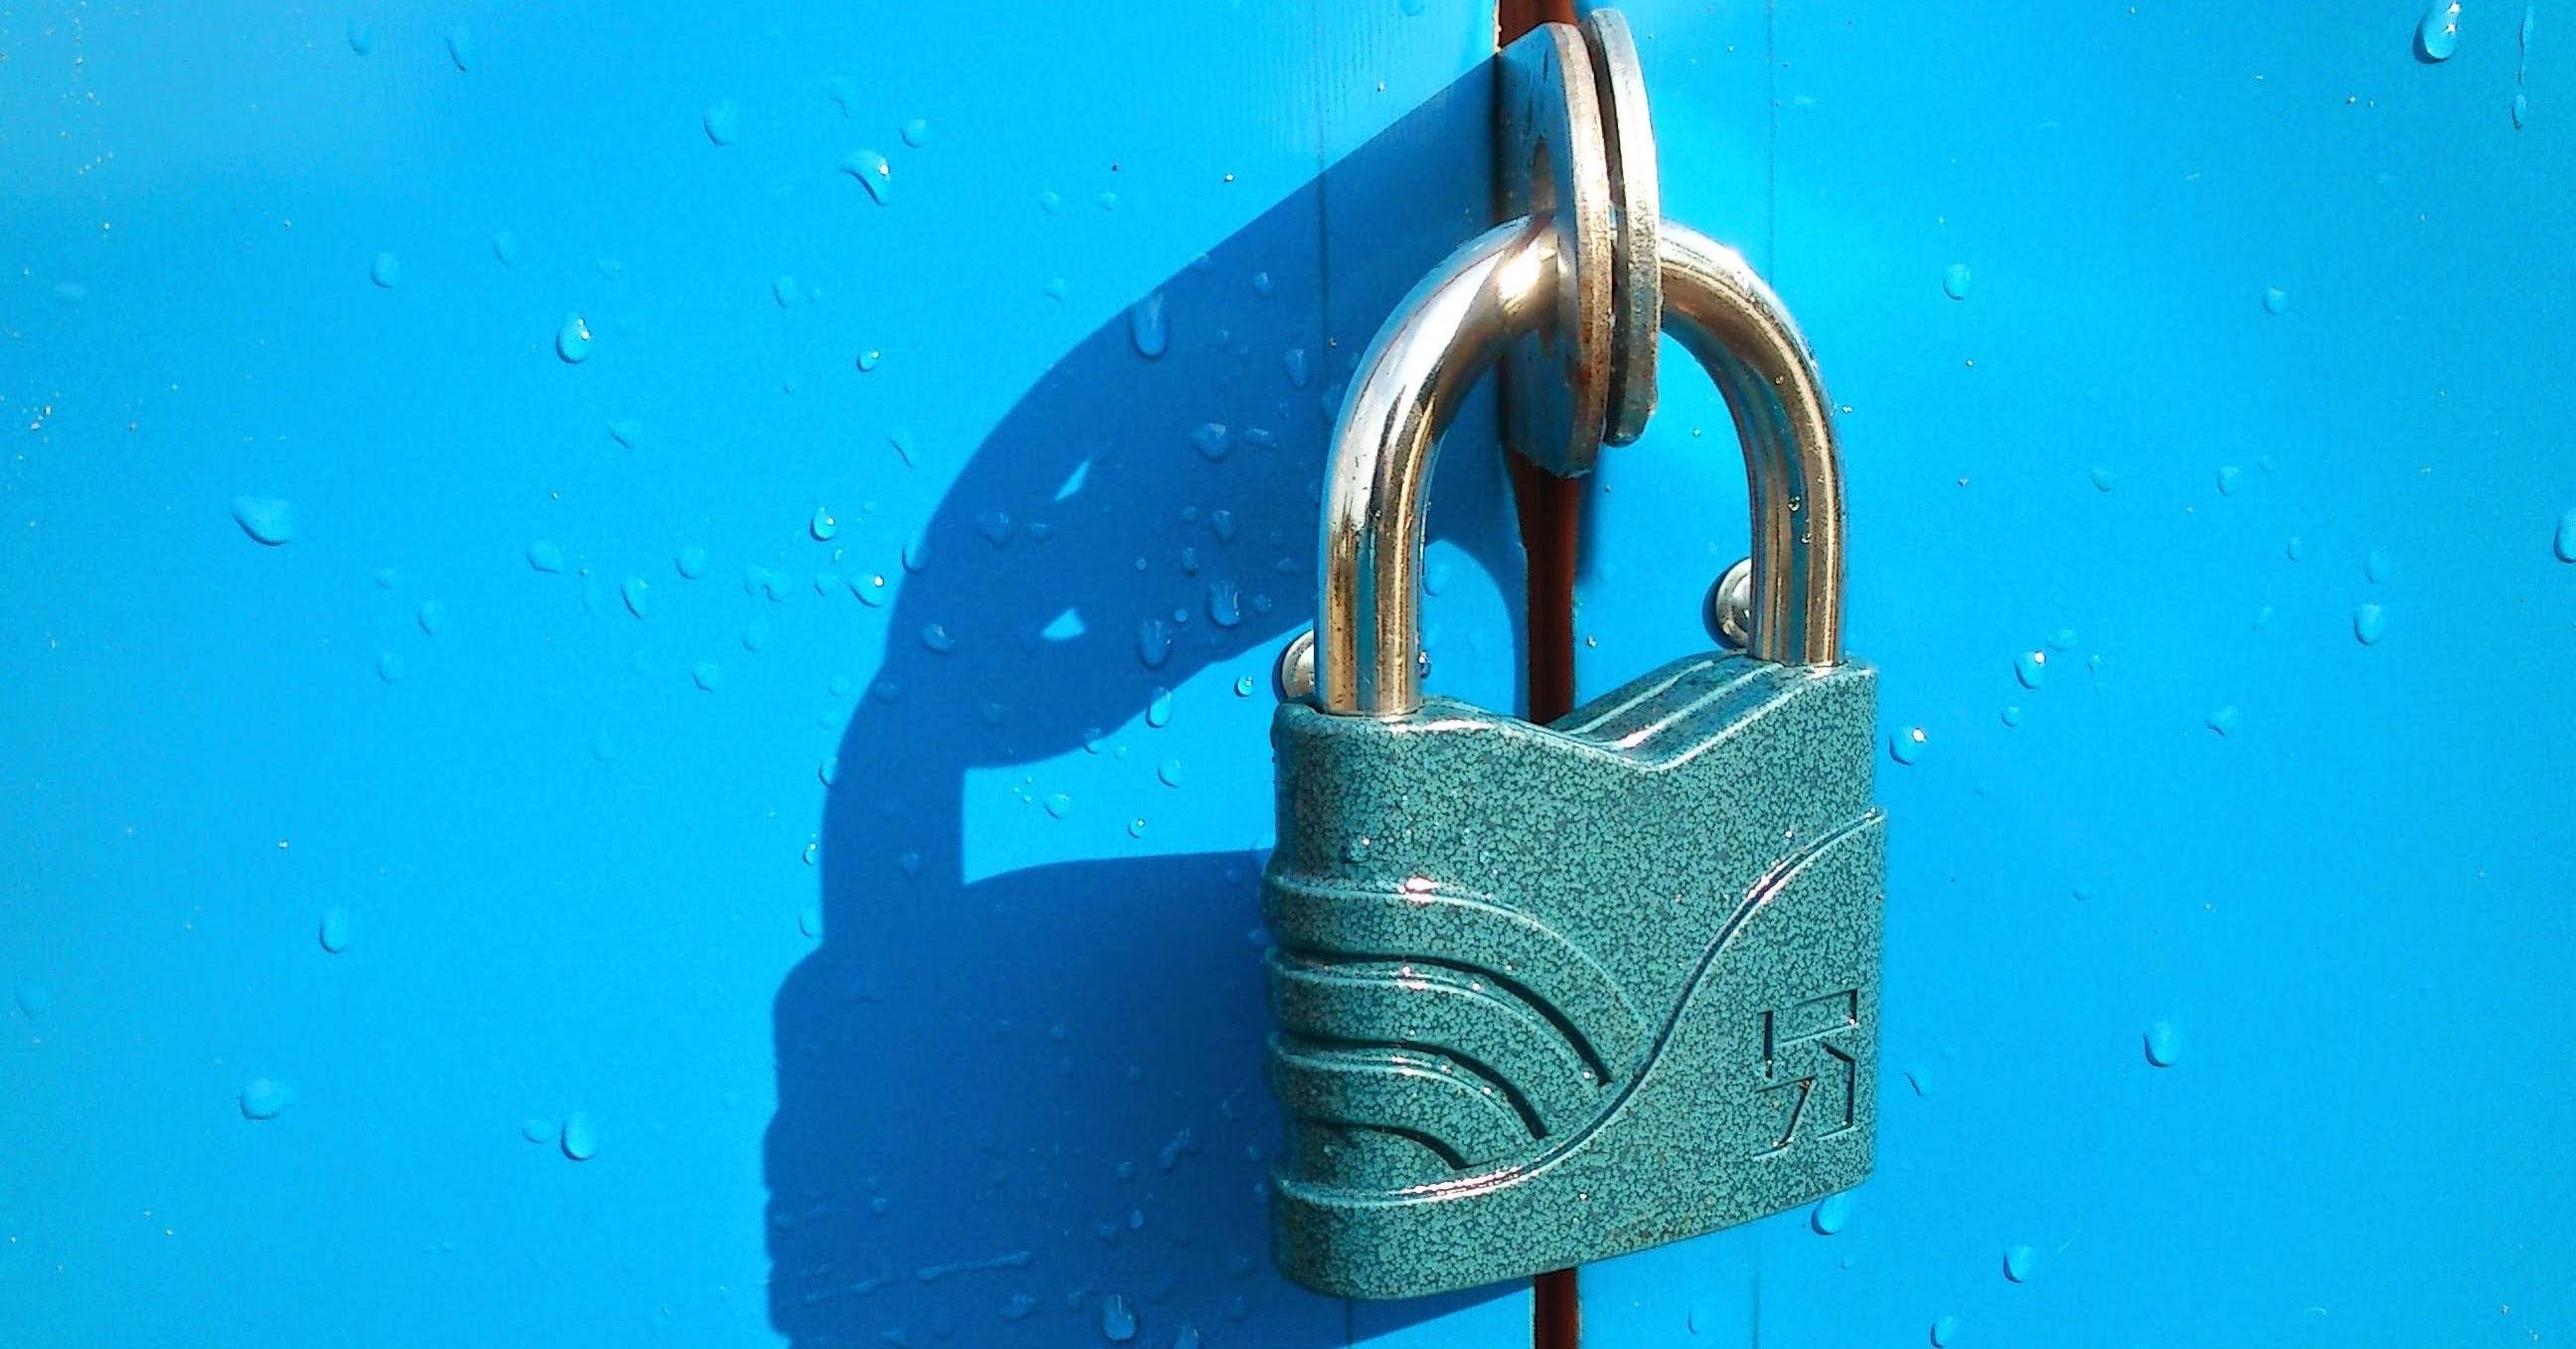 Schloss: Verschlüsselung von Daten nach Ransomware-angriff